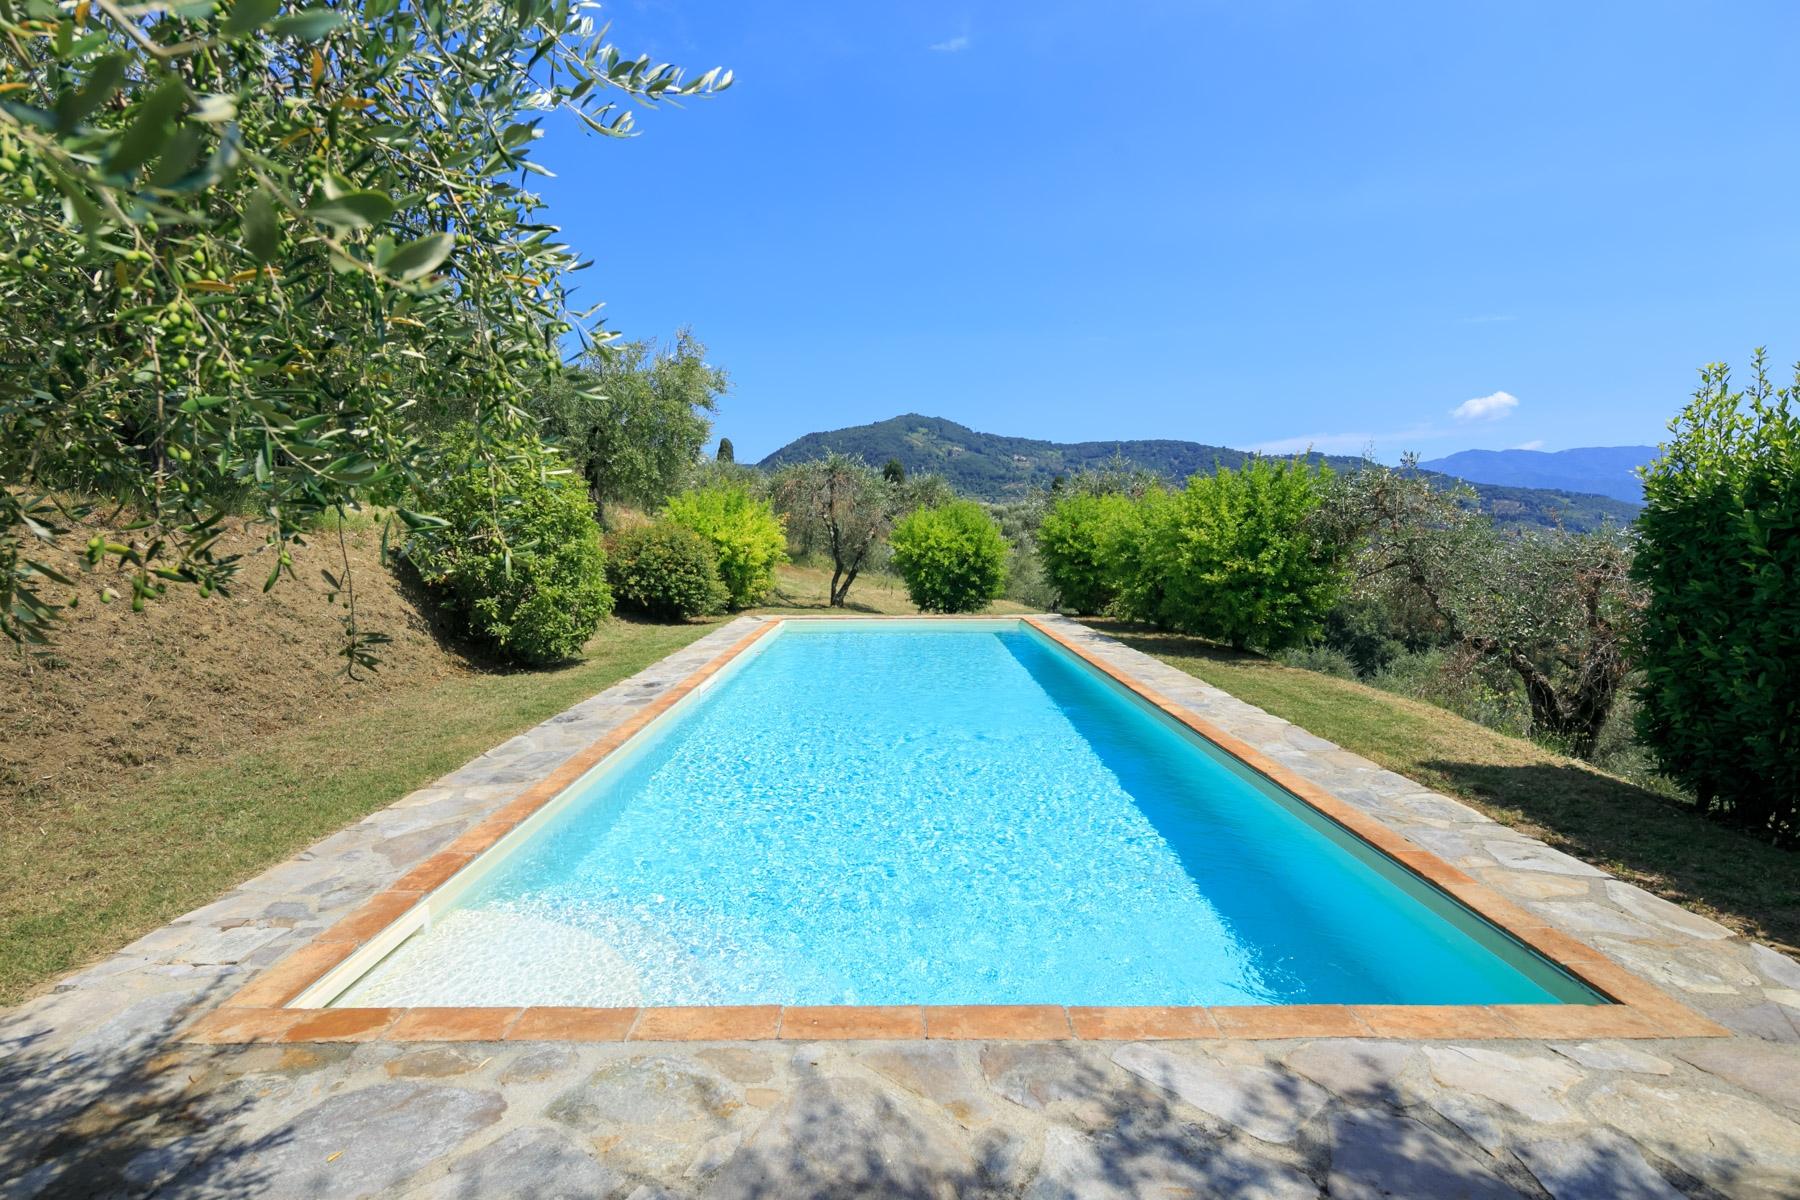 Villa in Vendita a Lucca: 5 locali, 225 mq - Foto 3